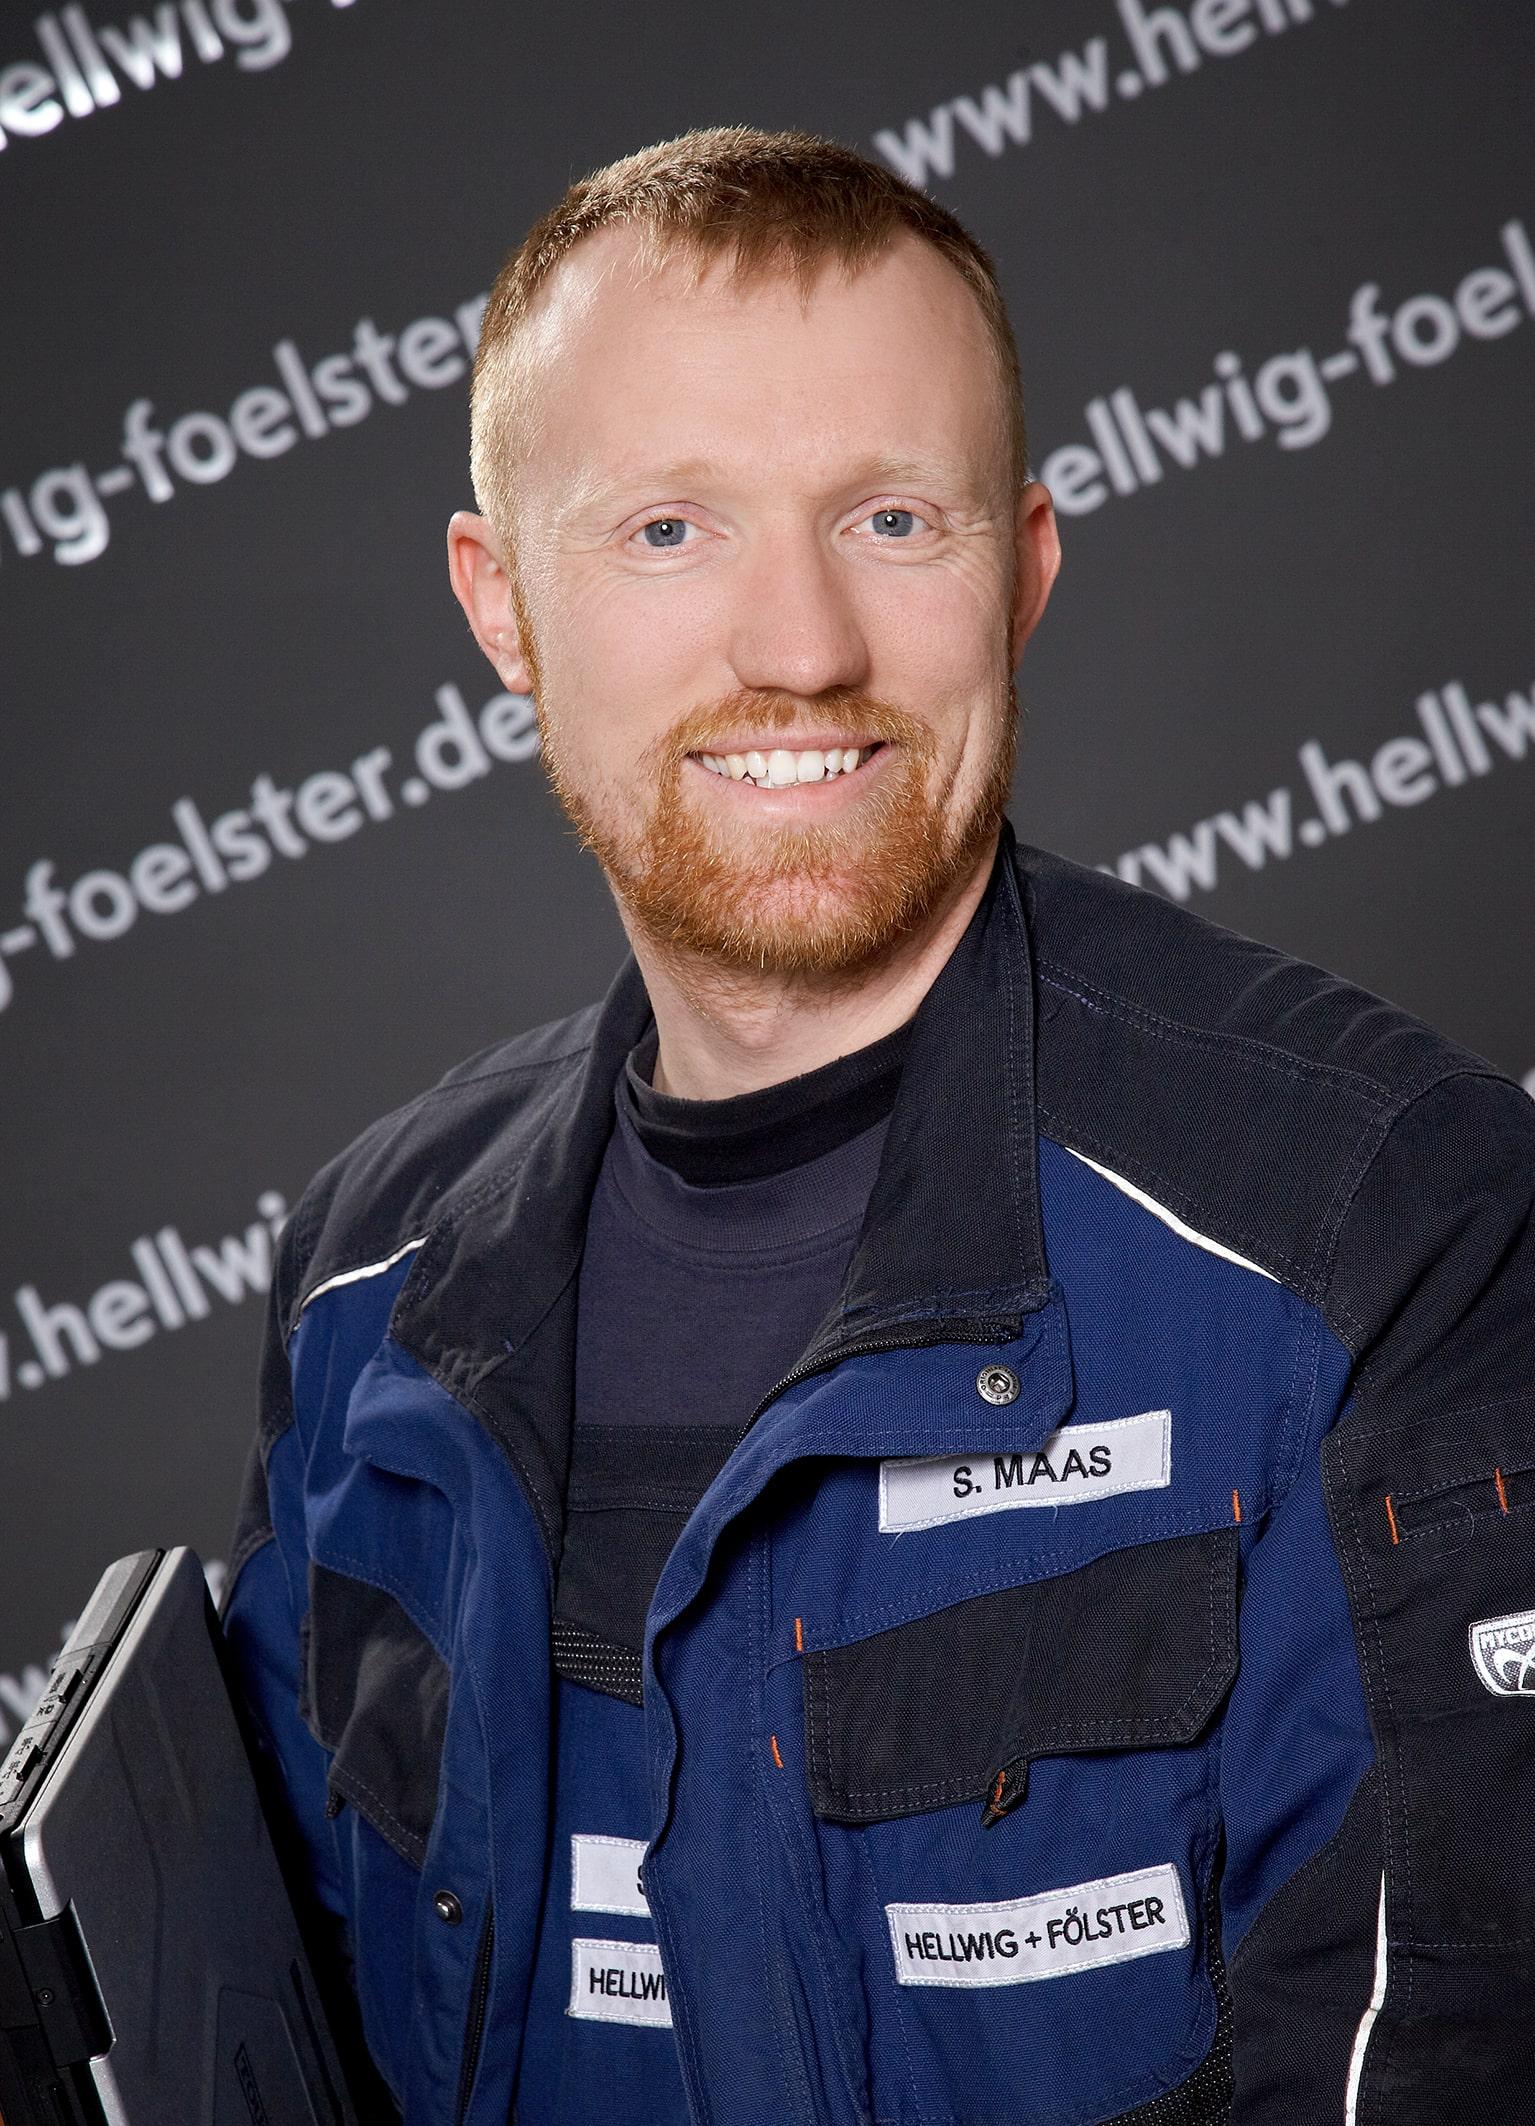 Stefan Maas Kfz. Meister